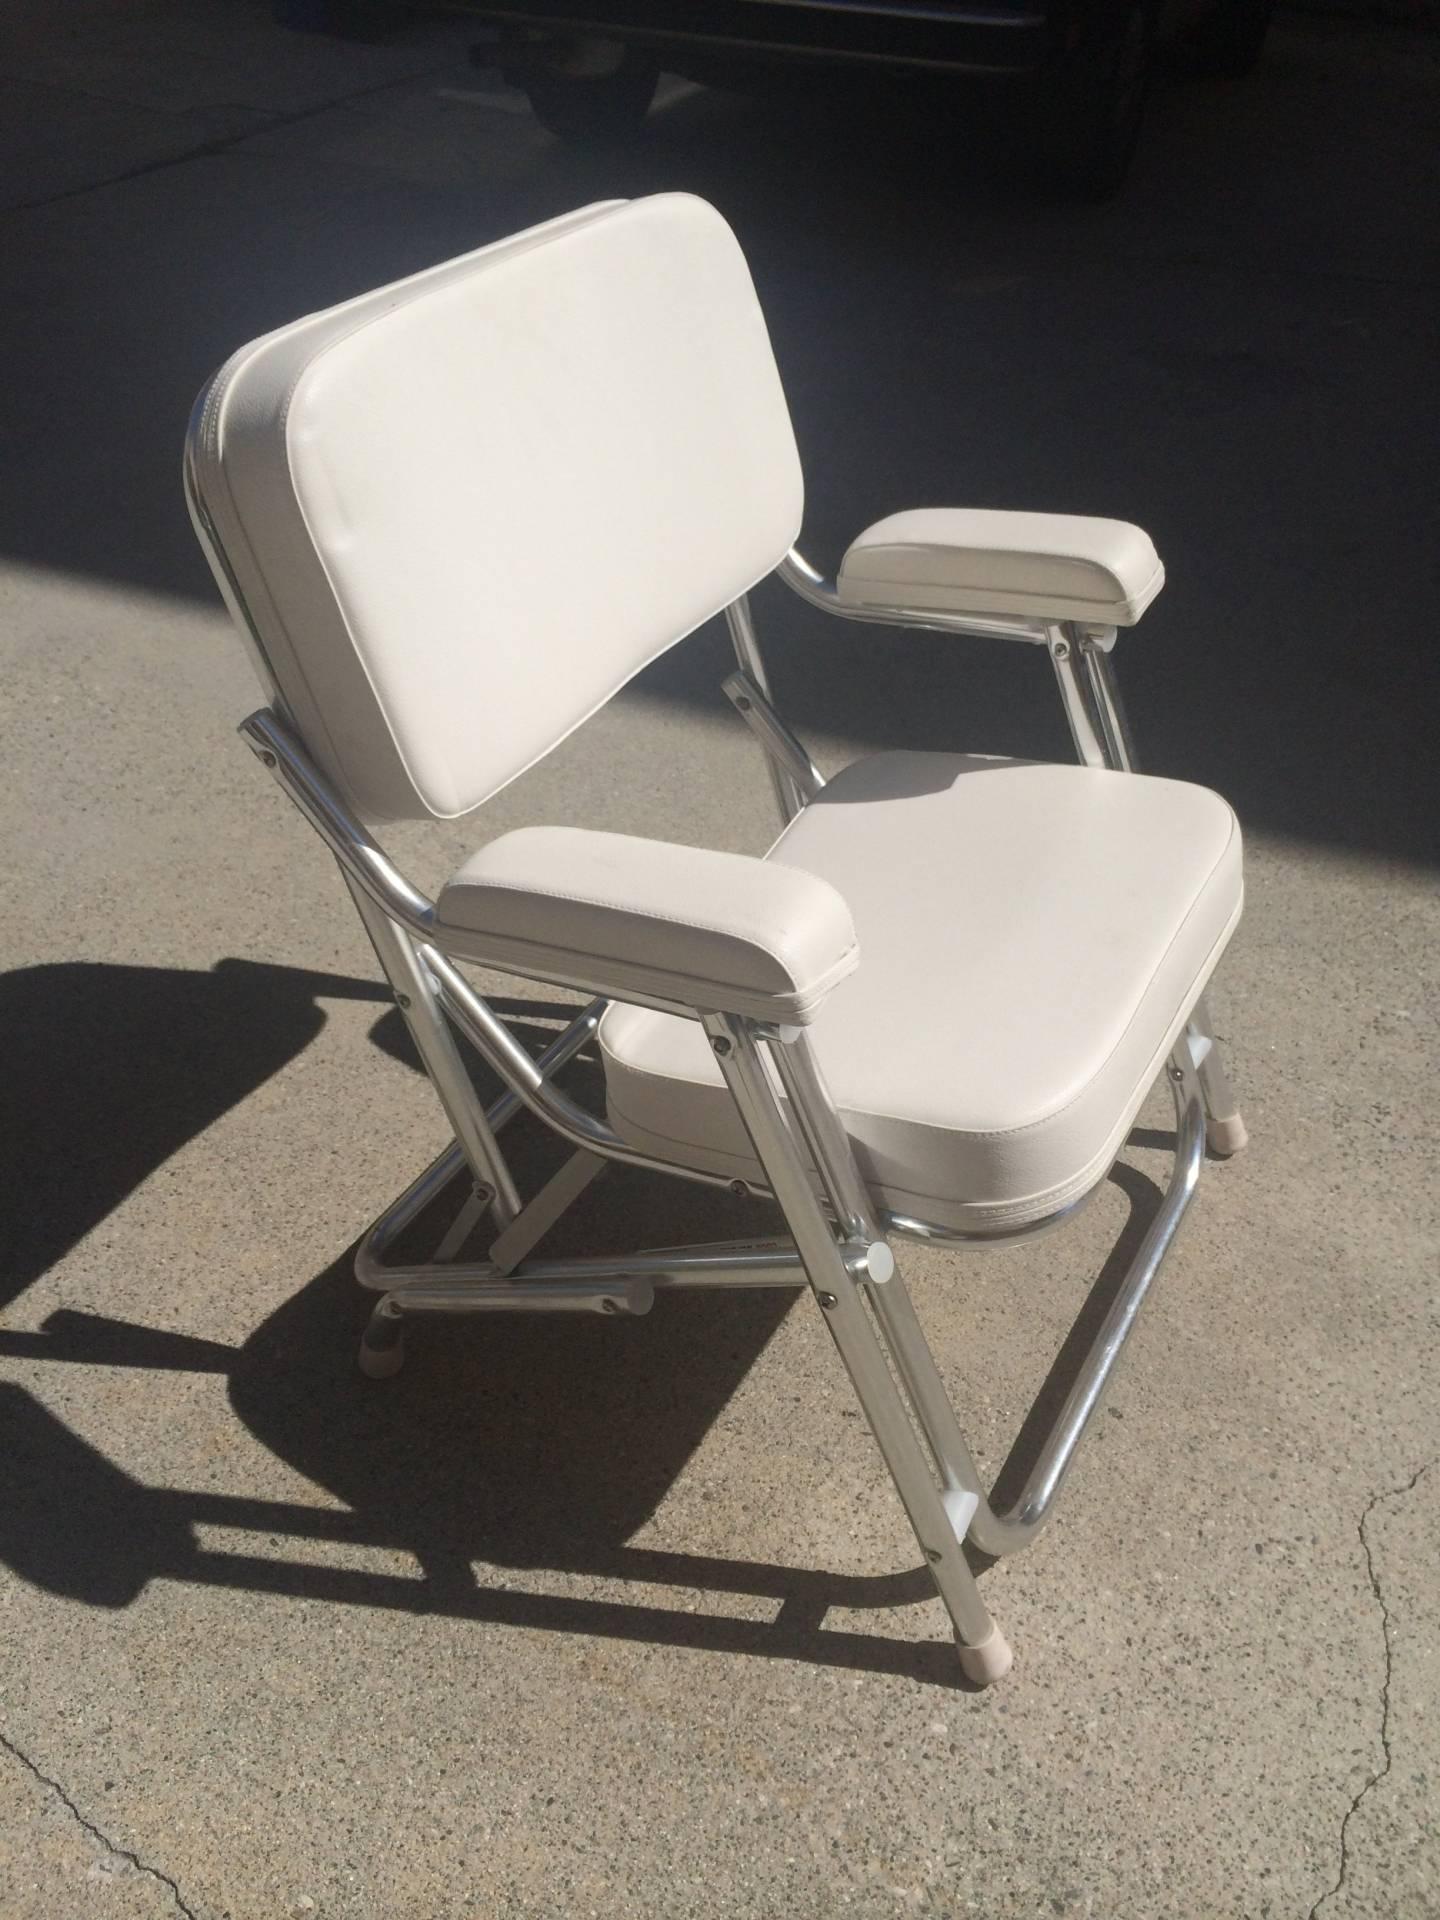 Two West Marine Aluminum Cushion Deck Chairs